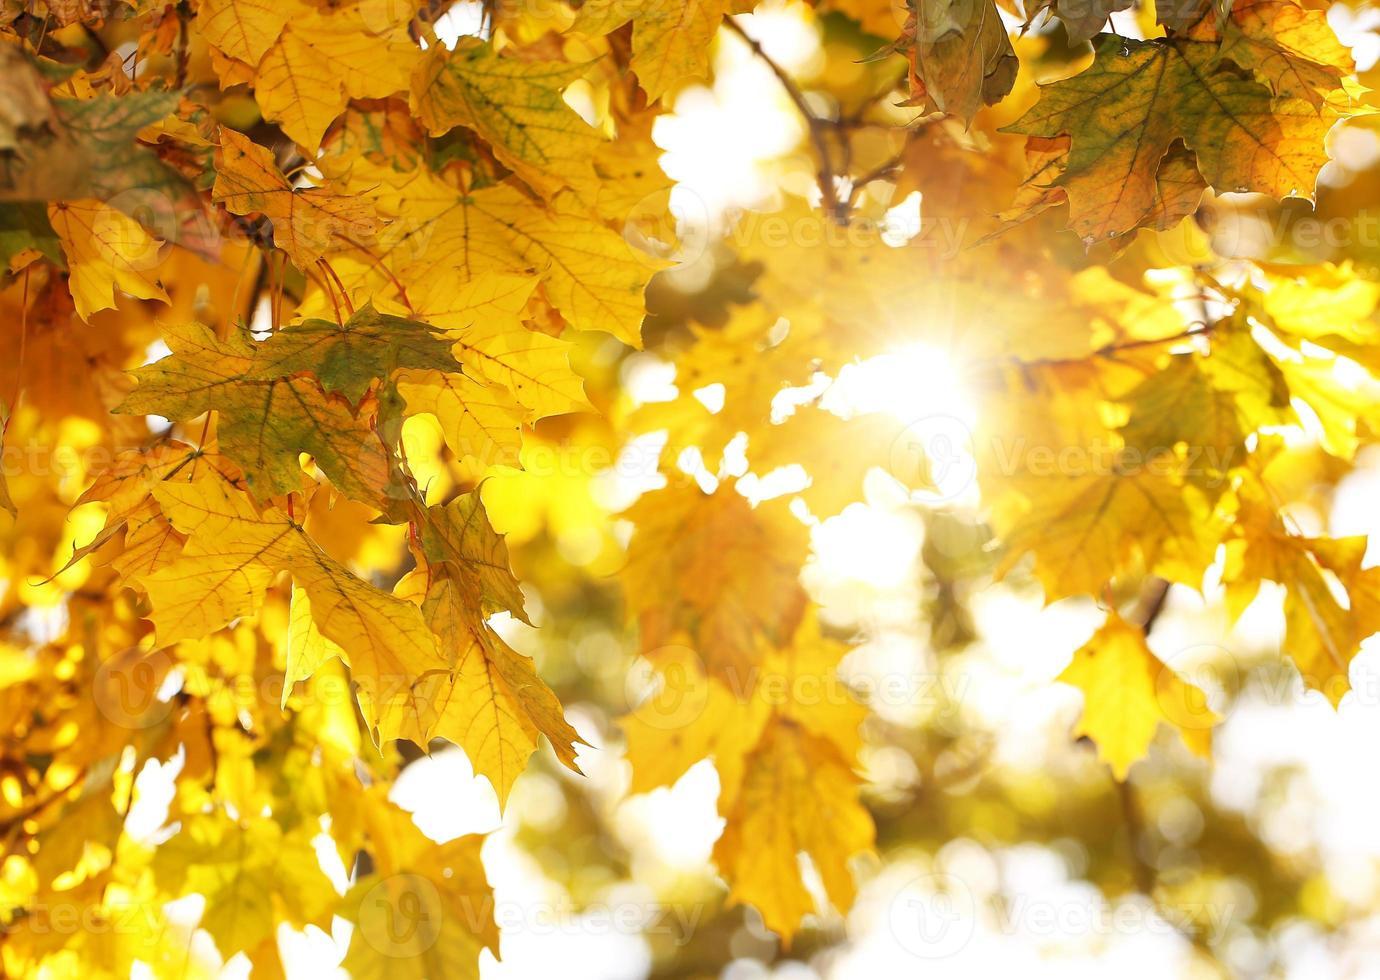 otoño. hojas de arce otoñal. foto